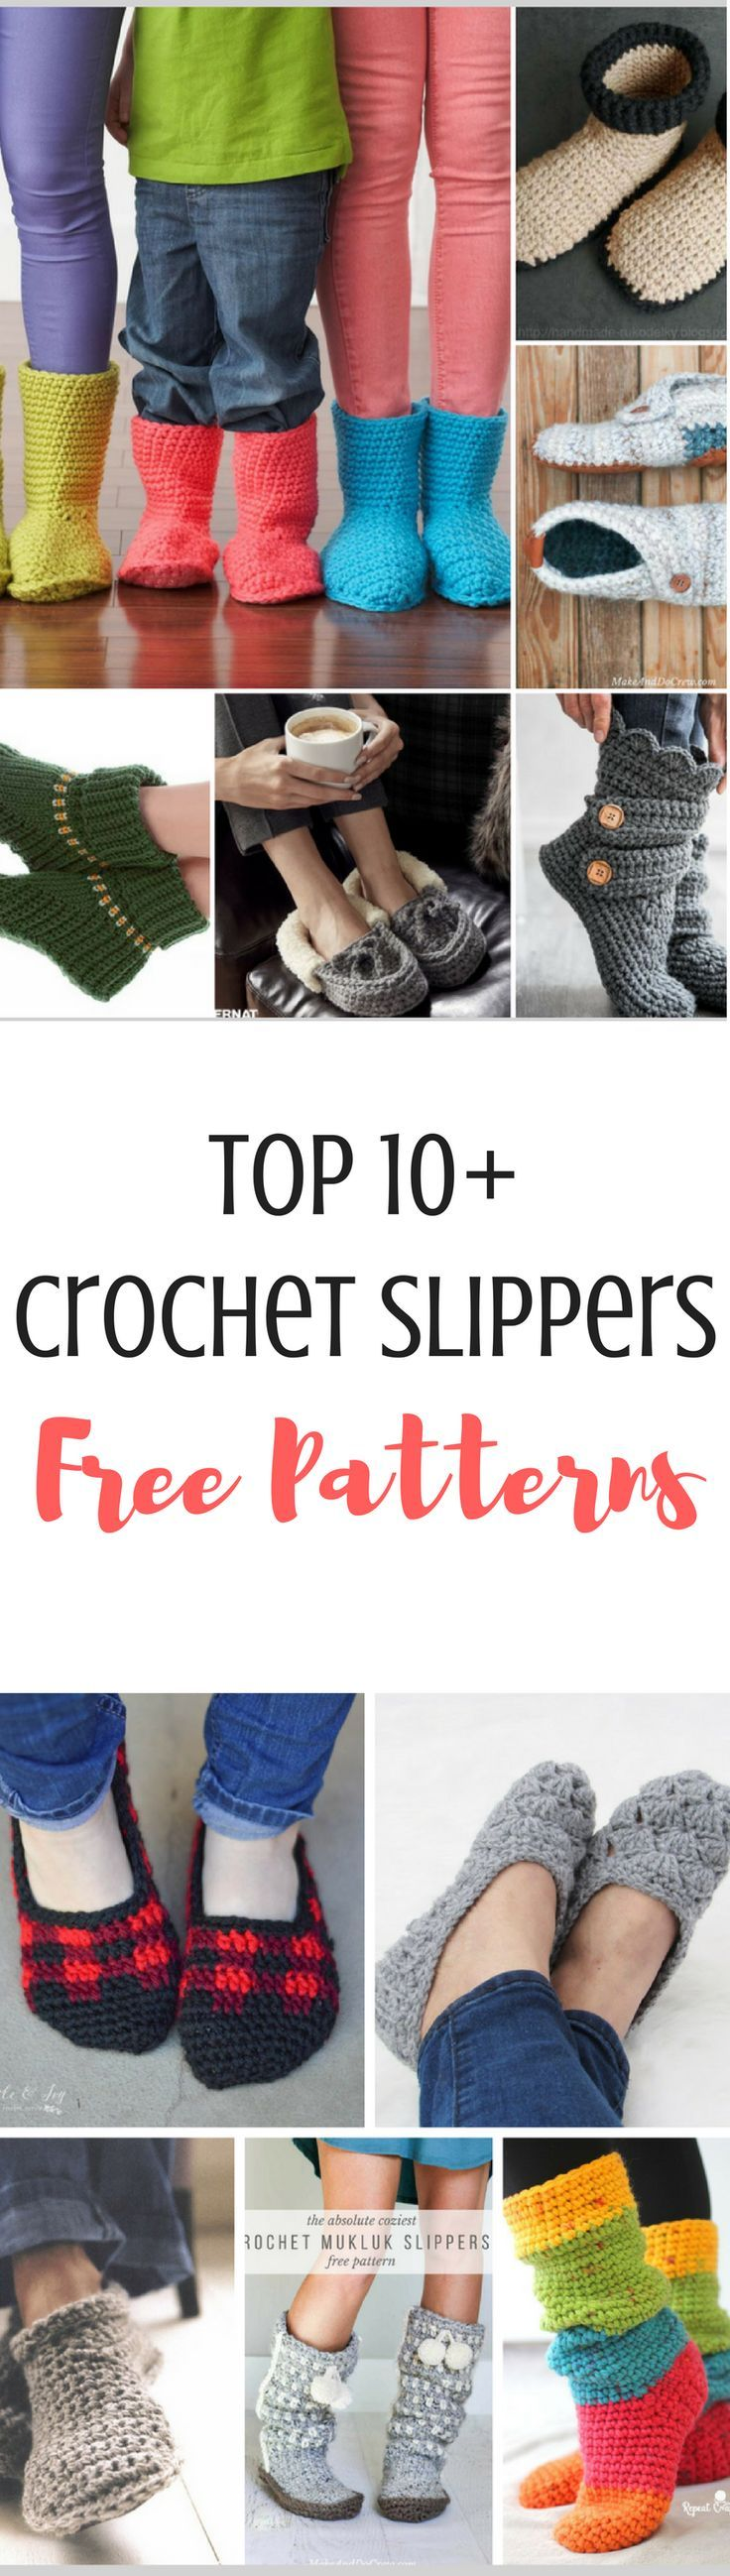 Top 10 Free Crochet Slippers Patterns | Patrones amigurumi, Patrones ...